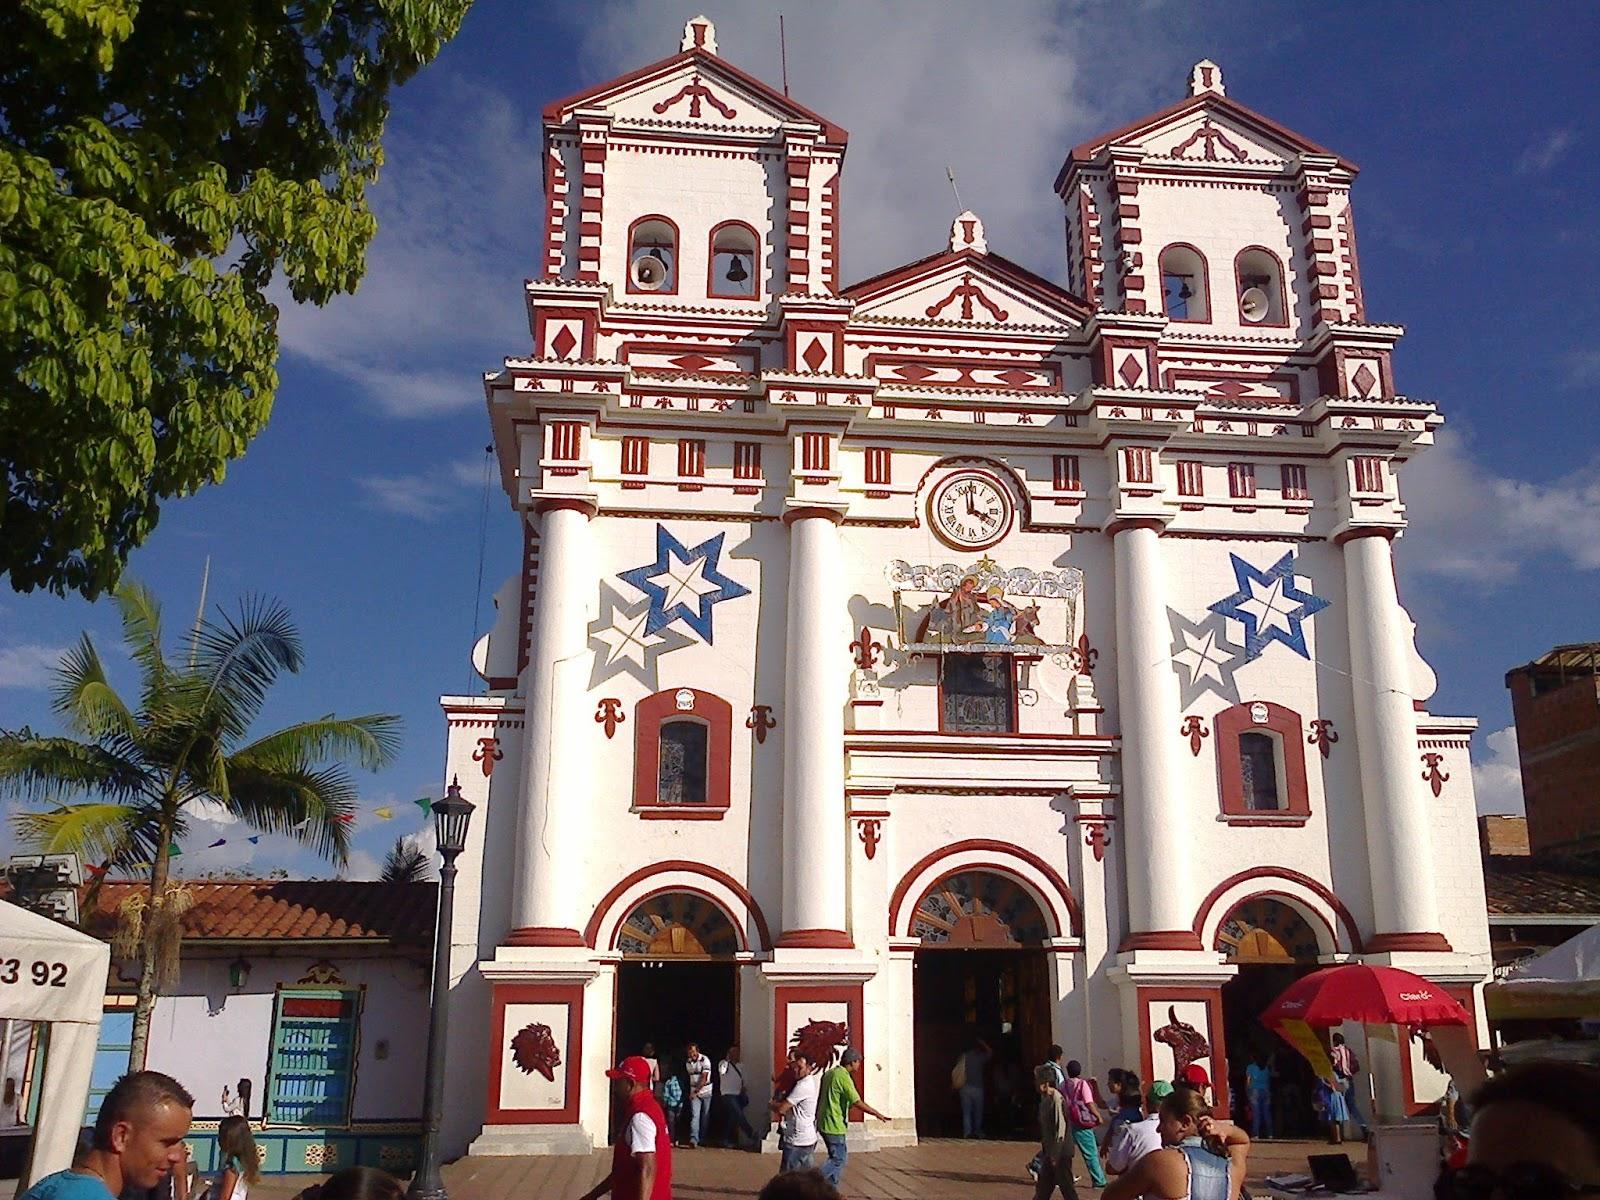 Kerk dichtbij Medellin in Colombië